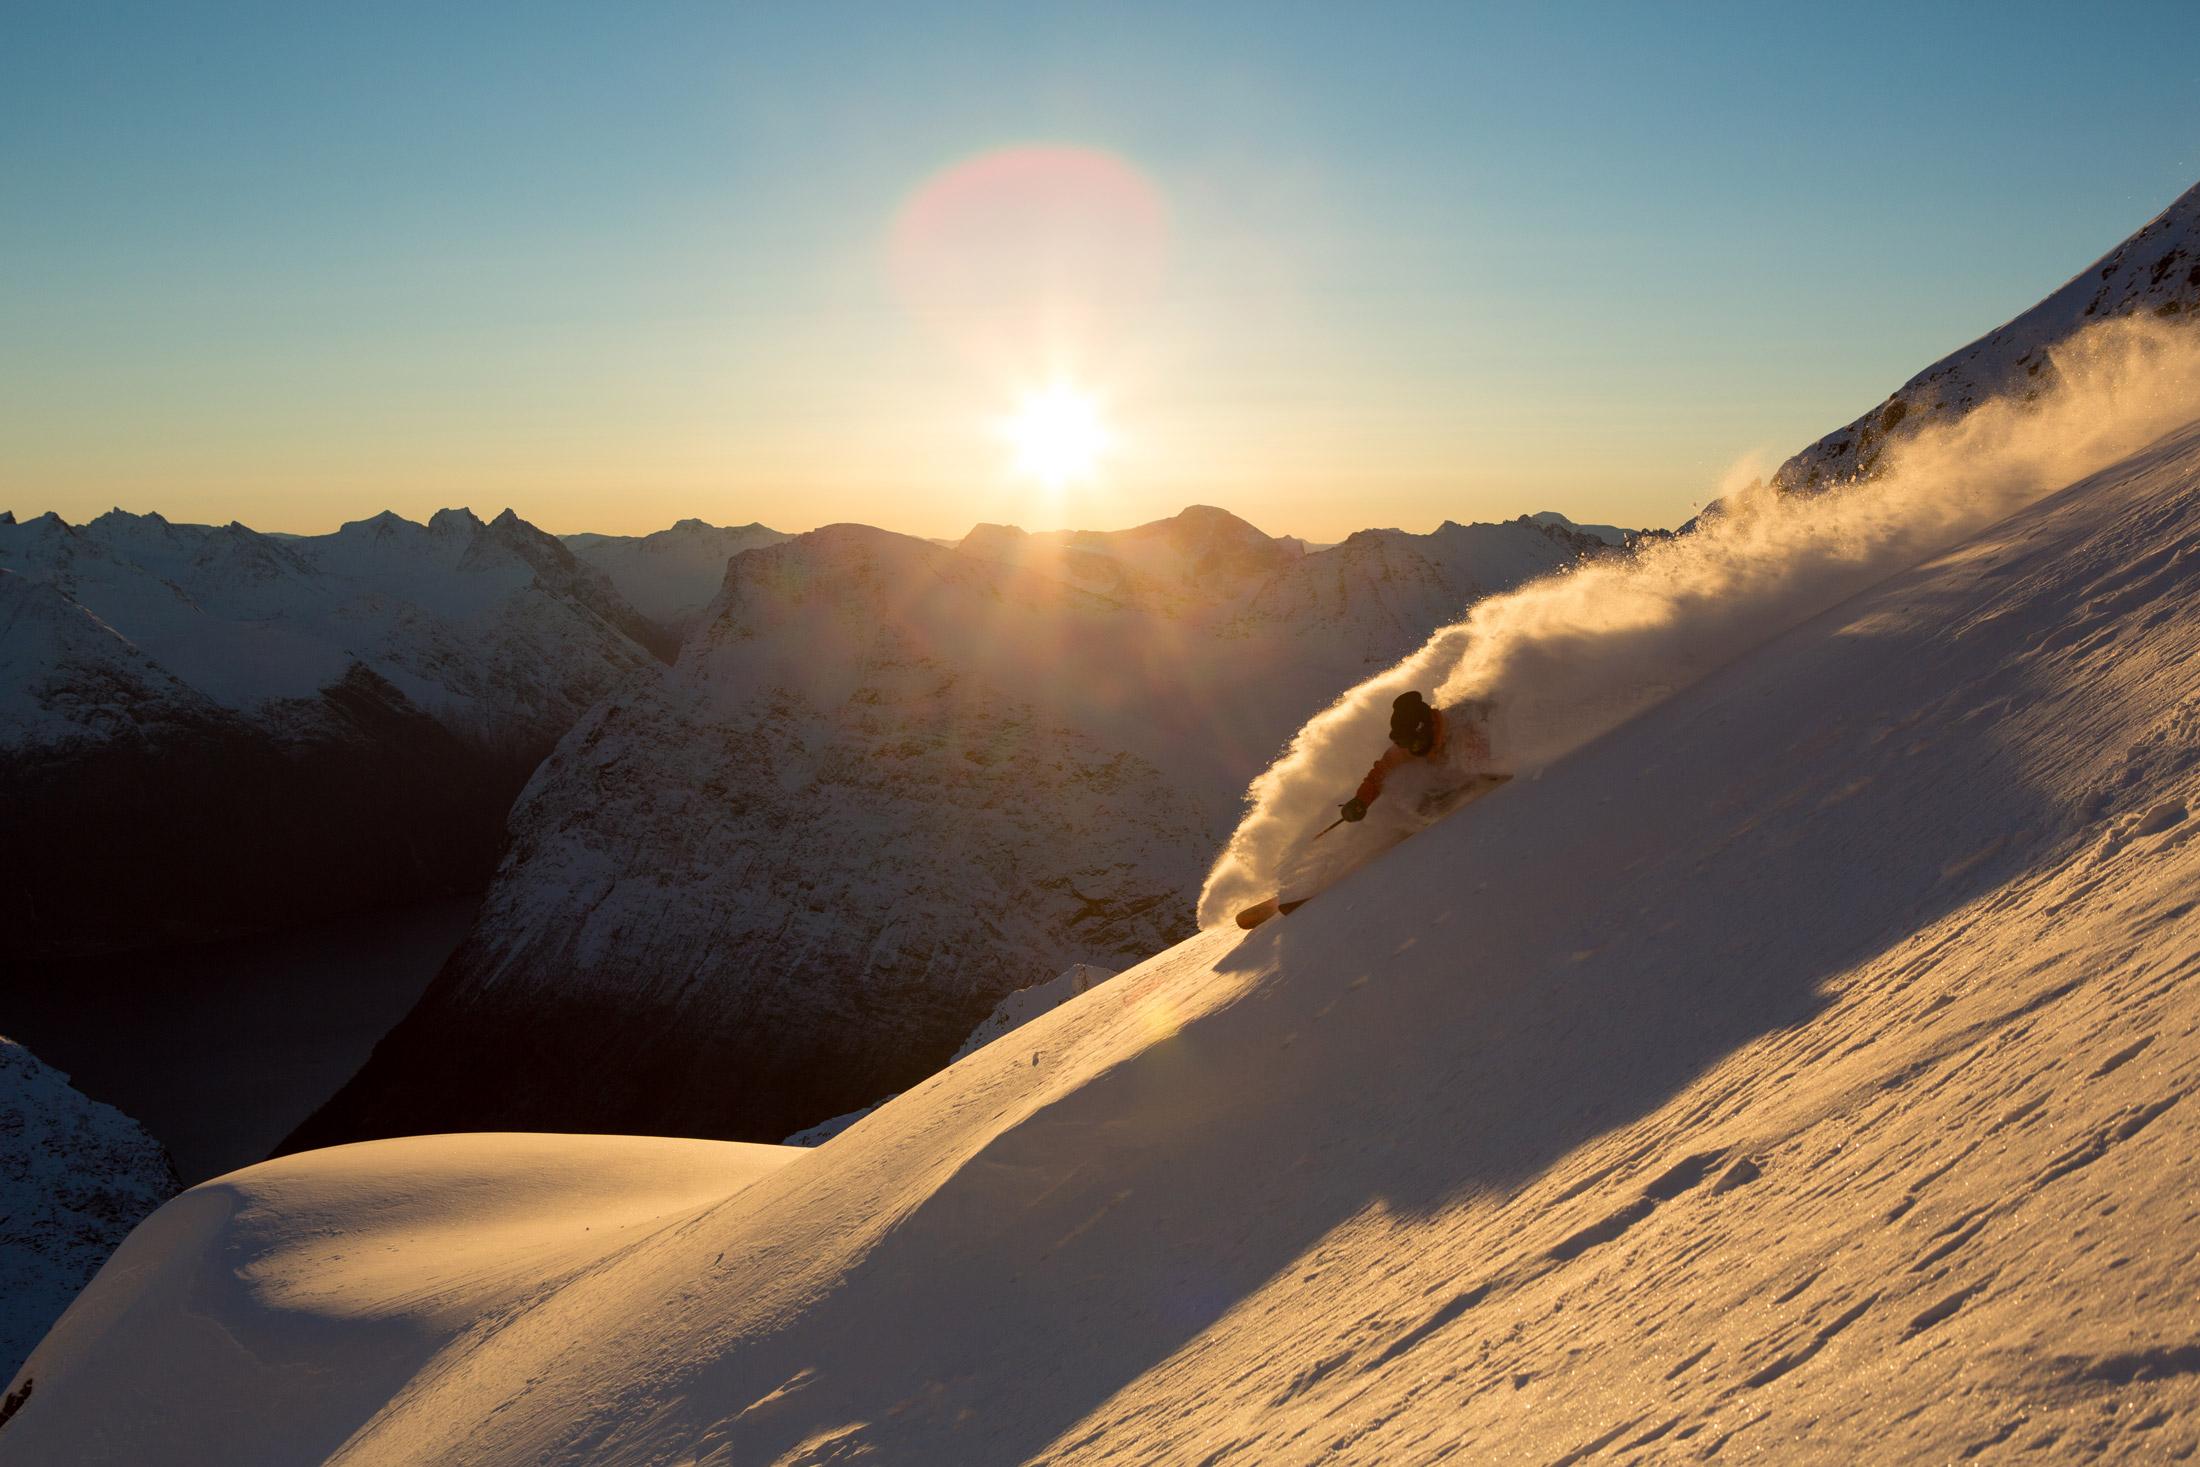 hellandshamn-ski-alpin-pudder